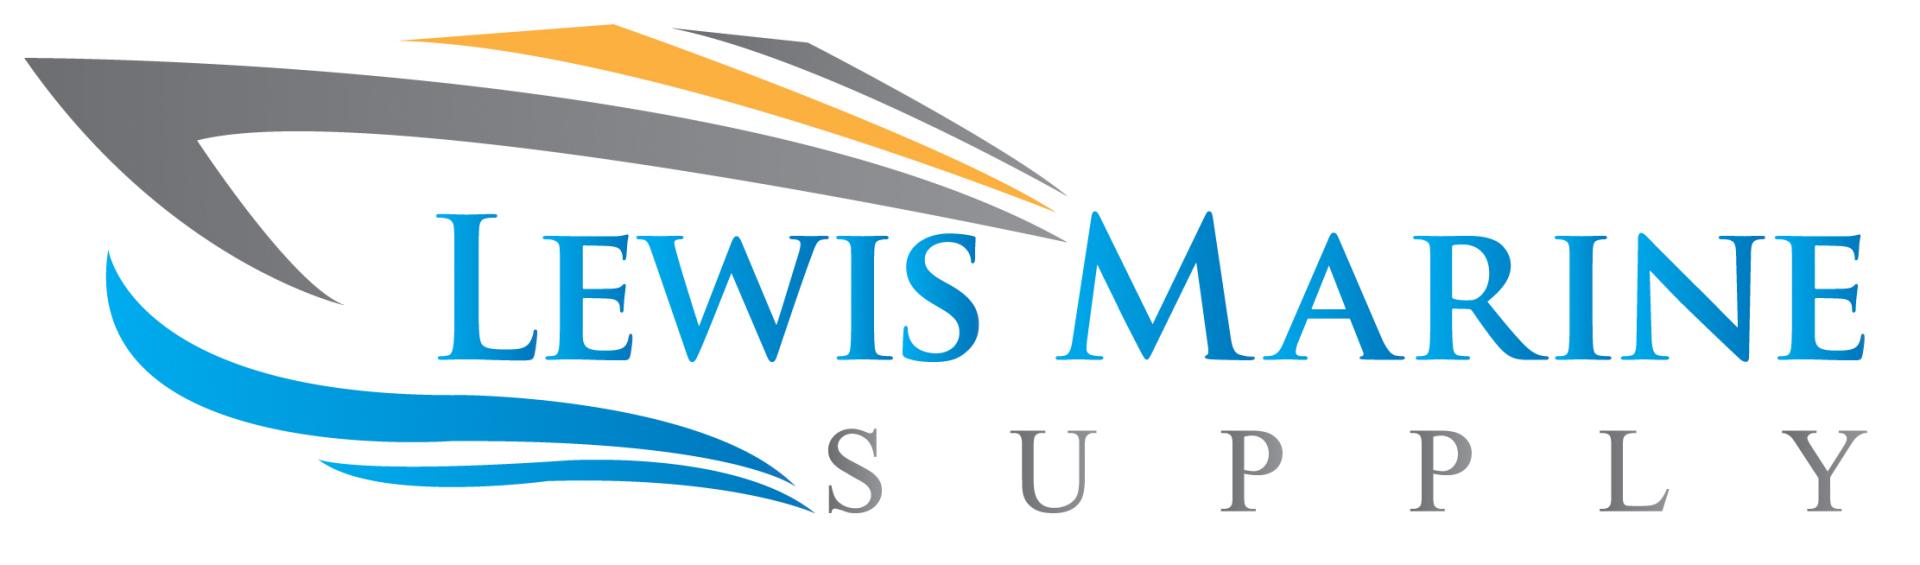 Business Highlight: Lewis Marine